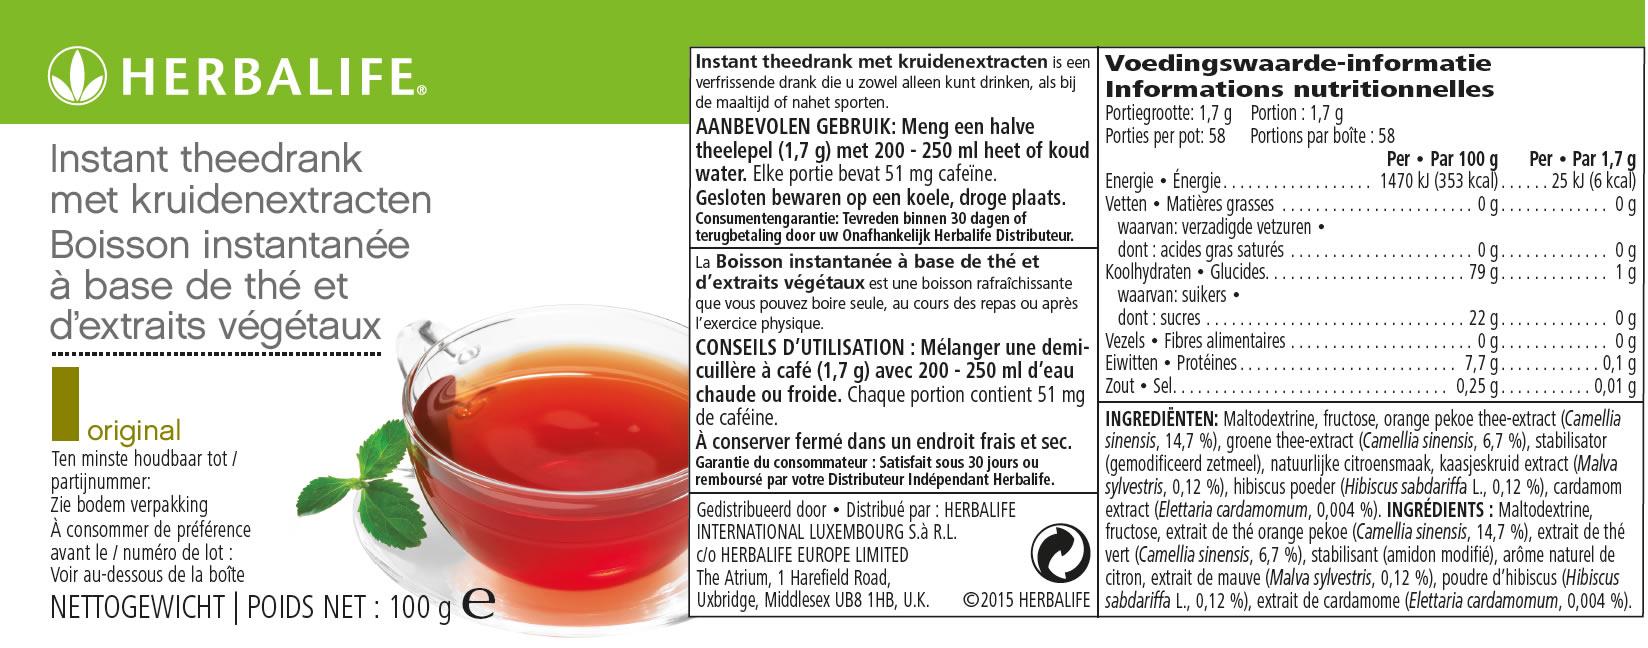 Herbalife Instant Theedrank Label